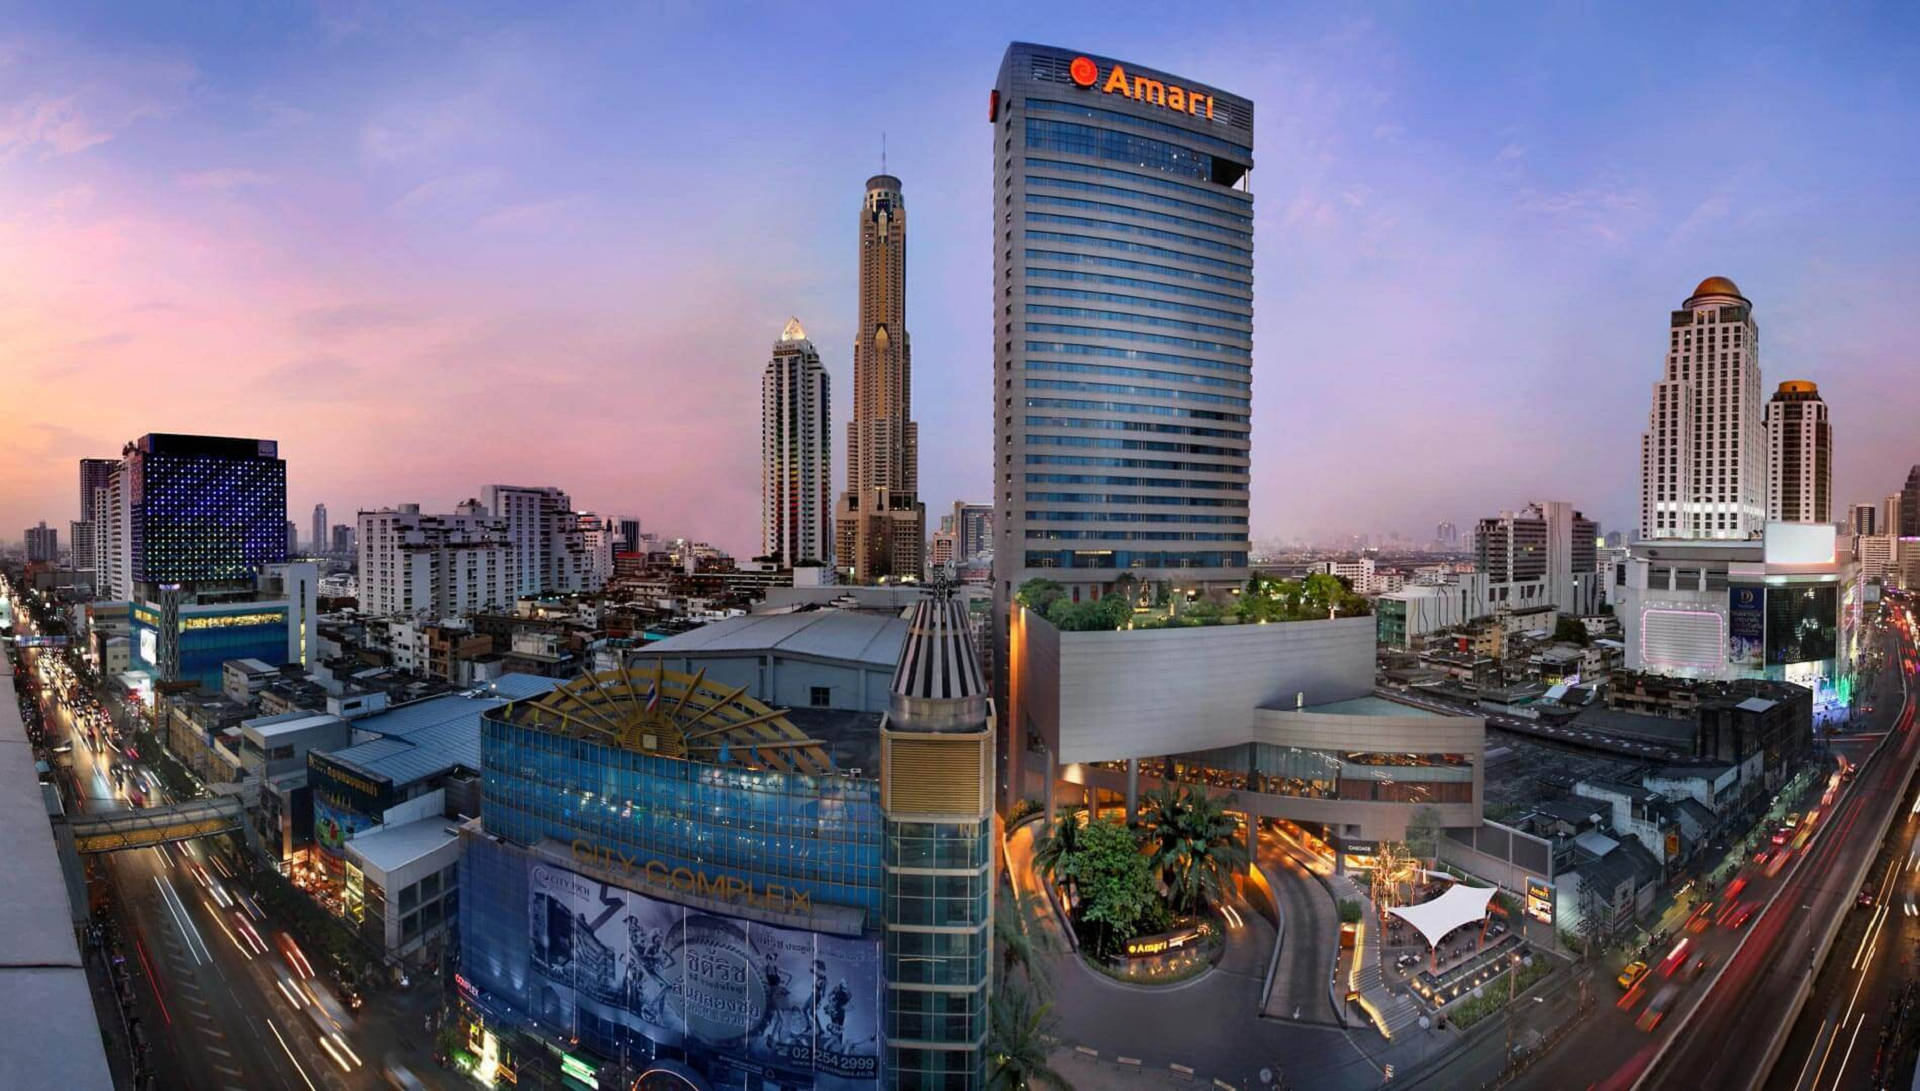 Bangkok Hd Background